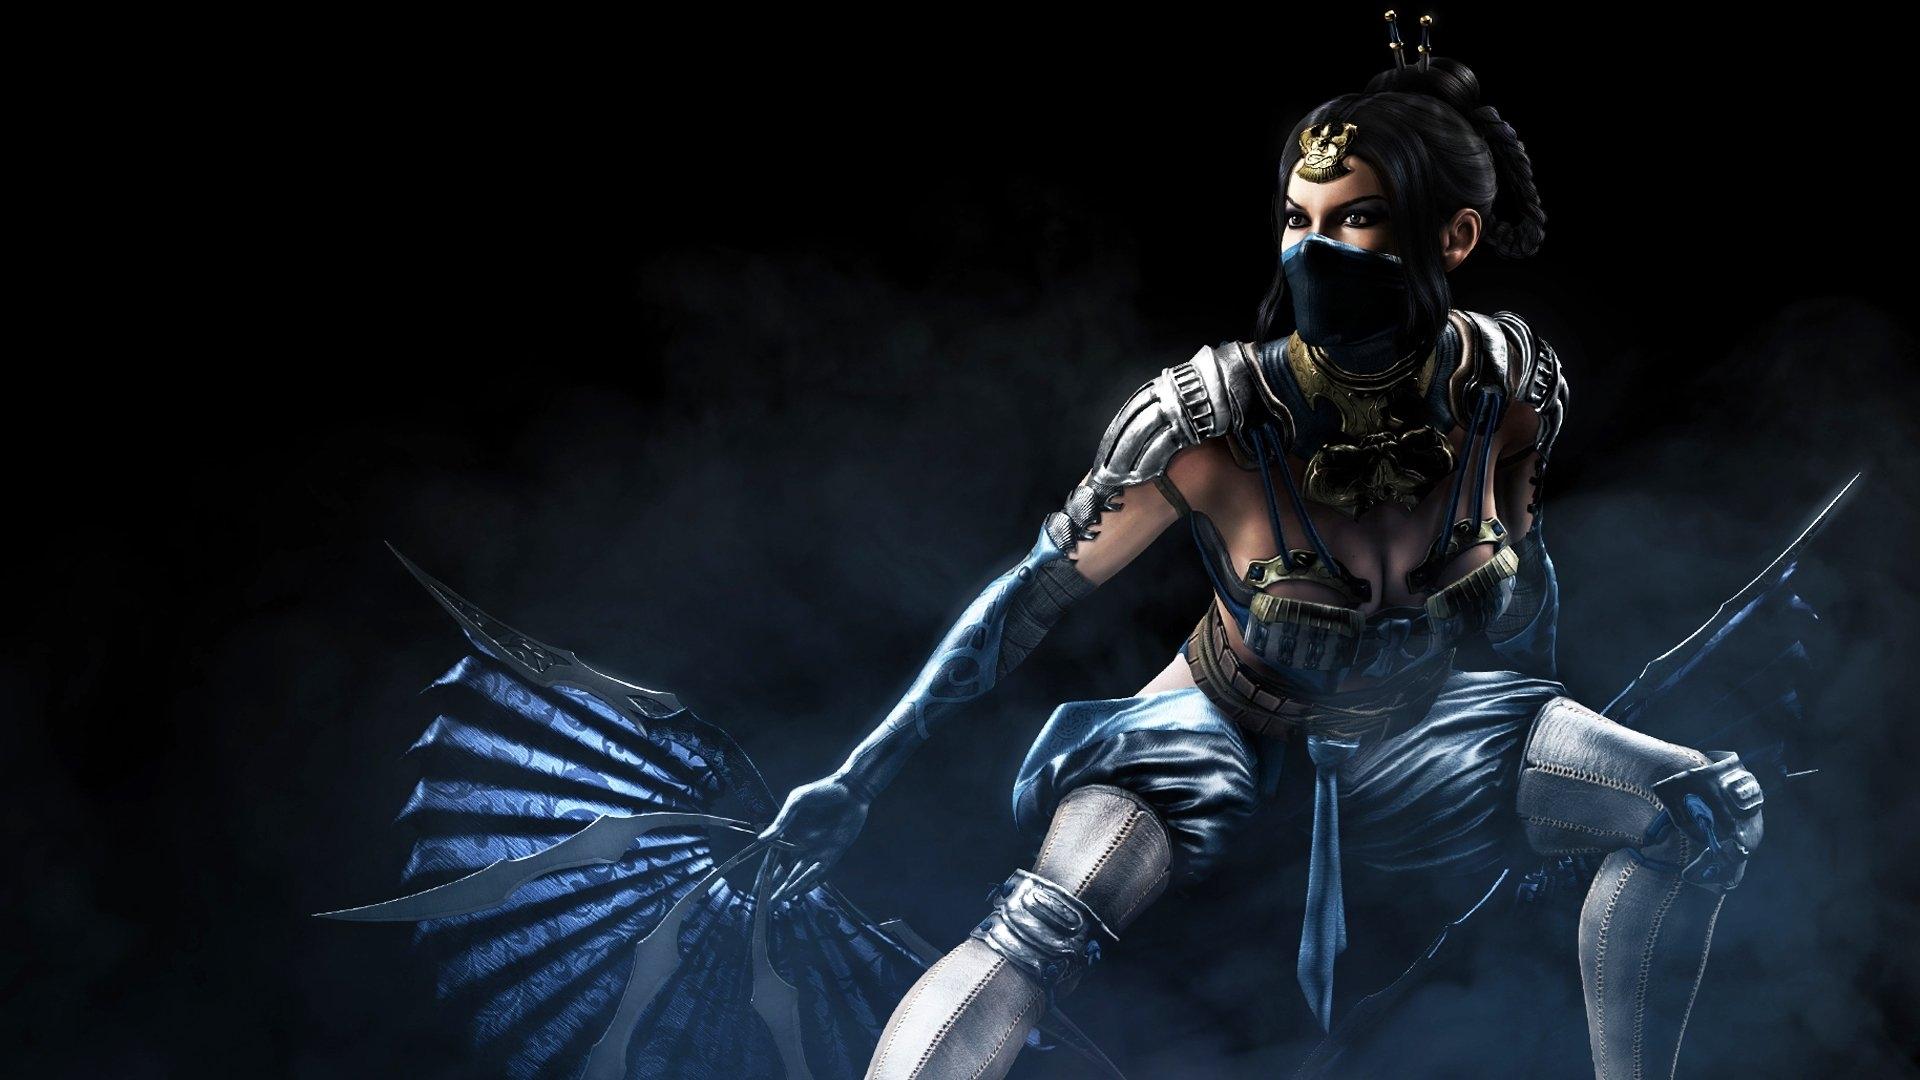 10 Best Mortal Kombat X Characters Wallpapers FULL HD 1920 ...